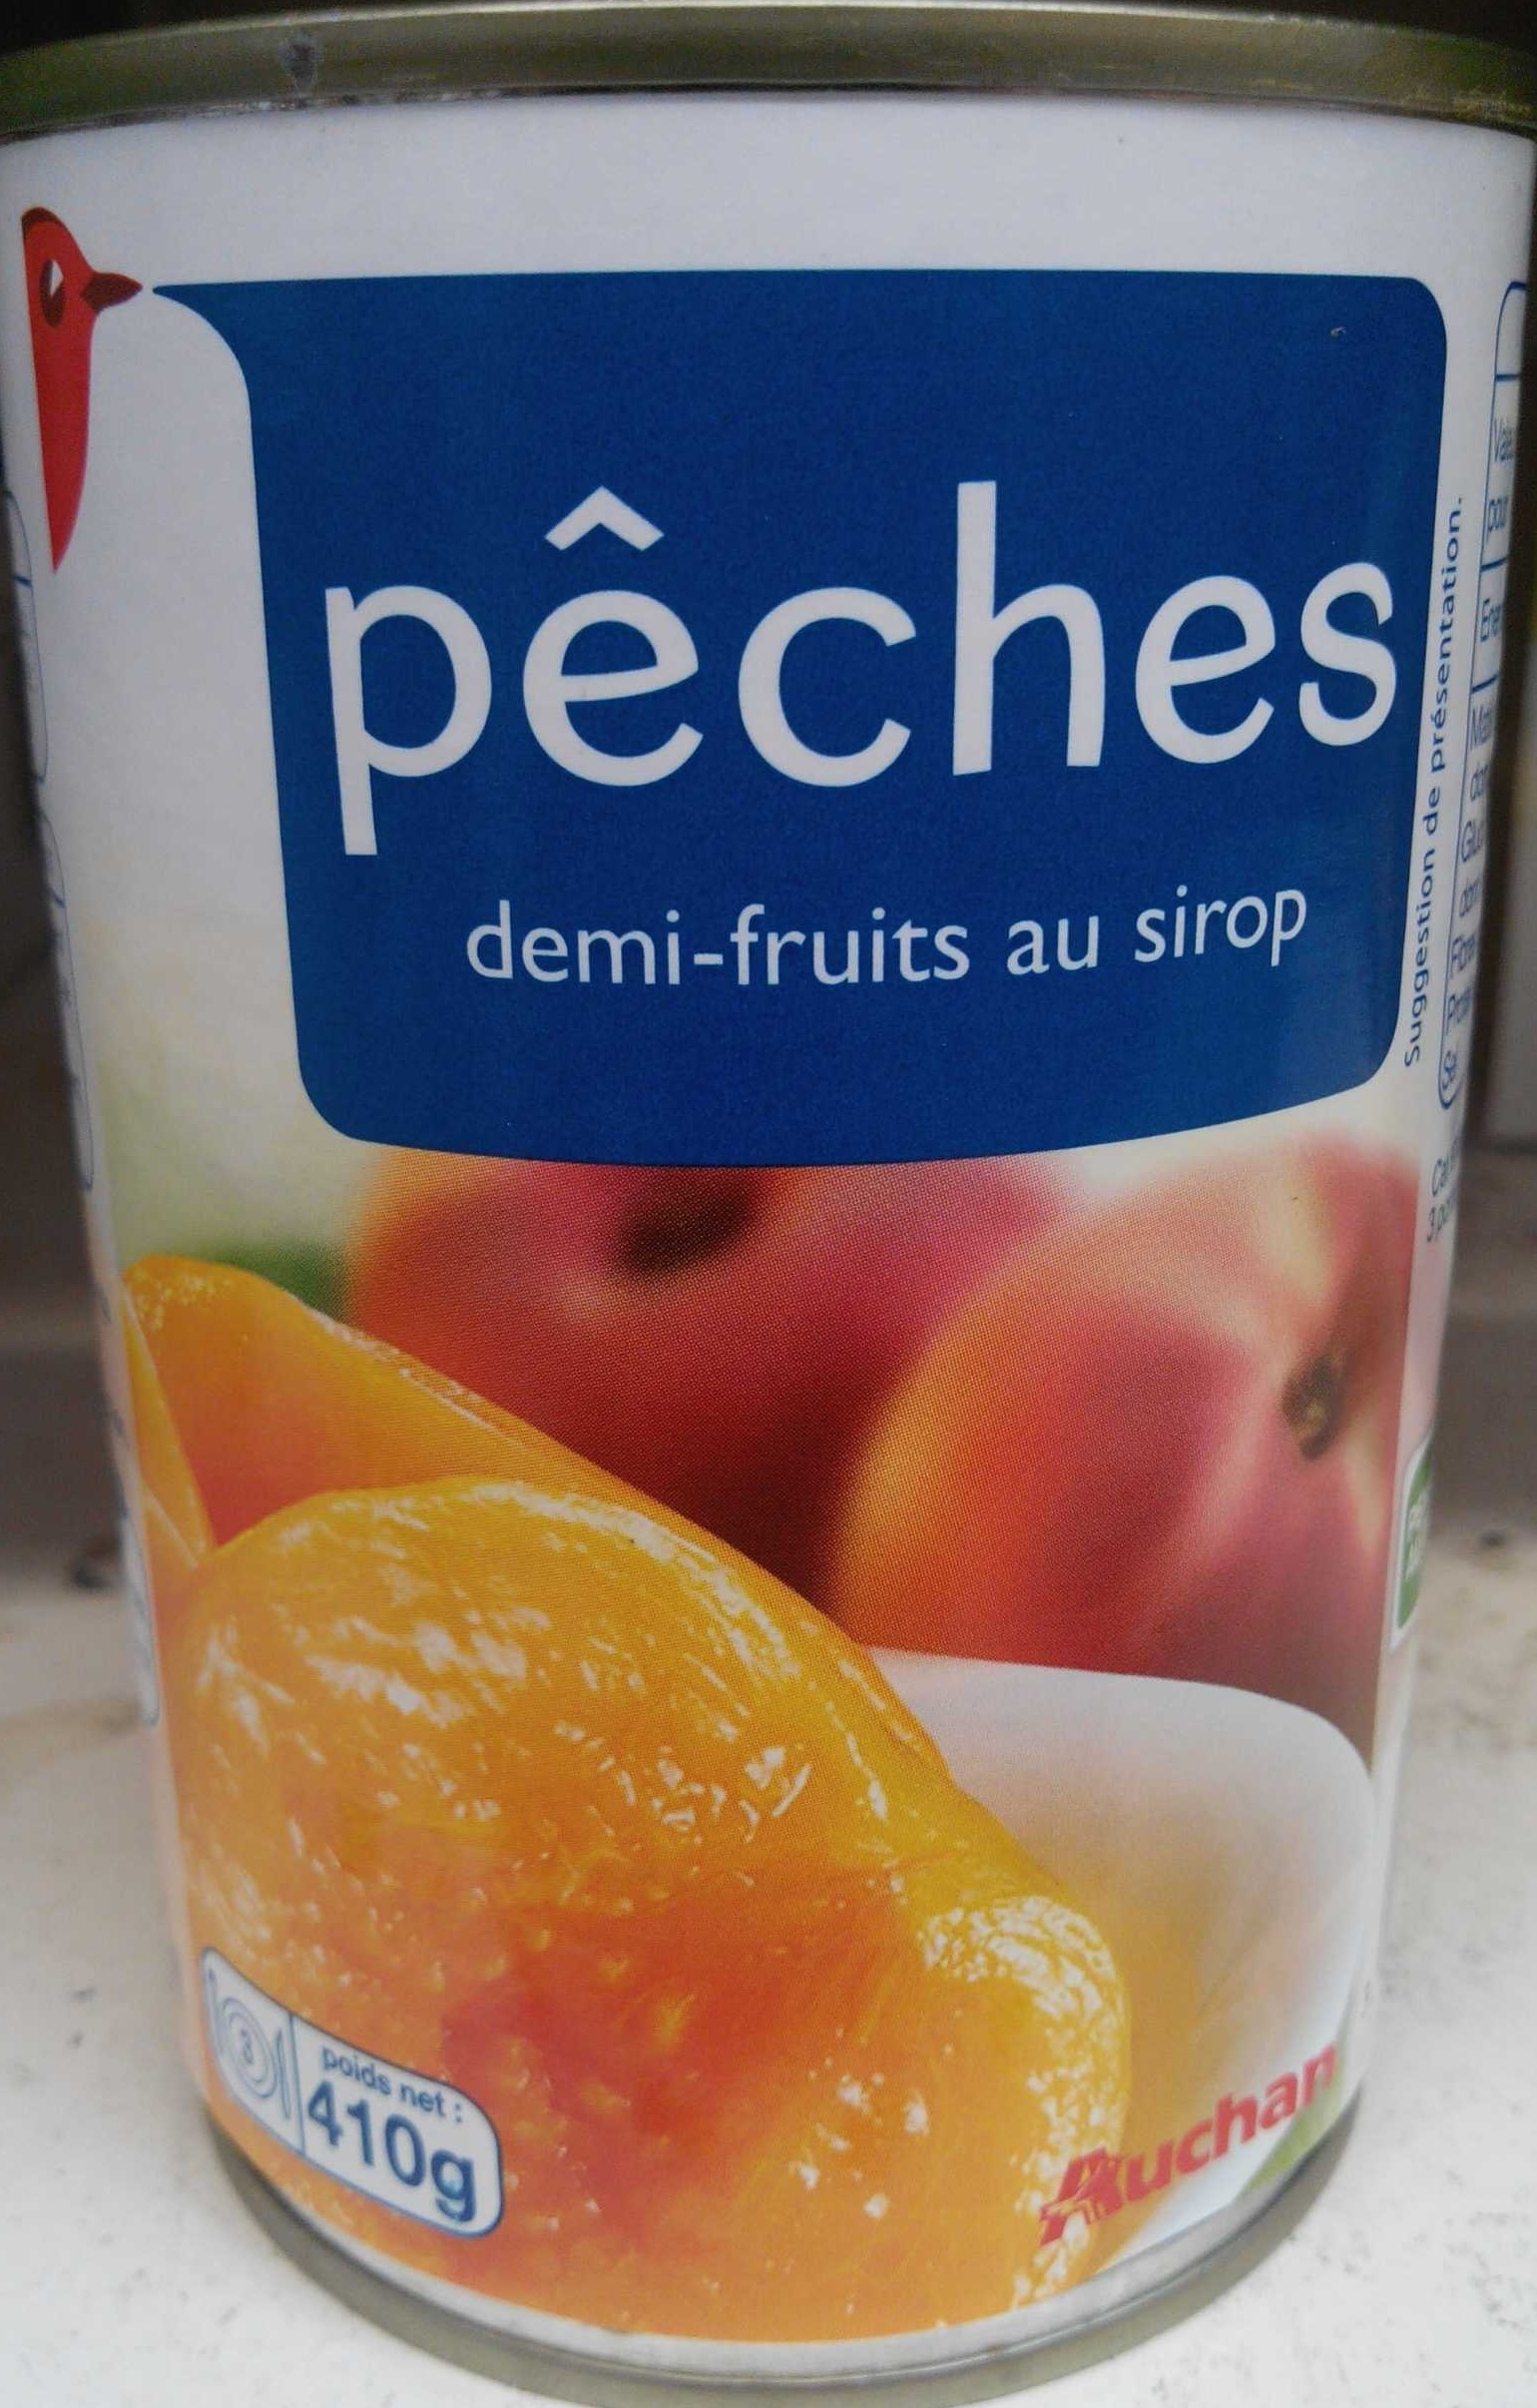 Pêches demi-fruits au sirop - Produit - fr